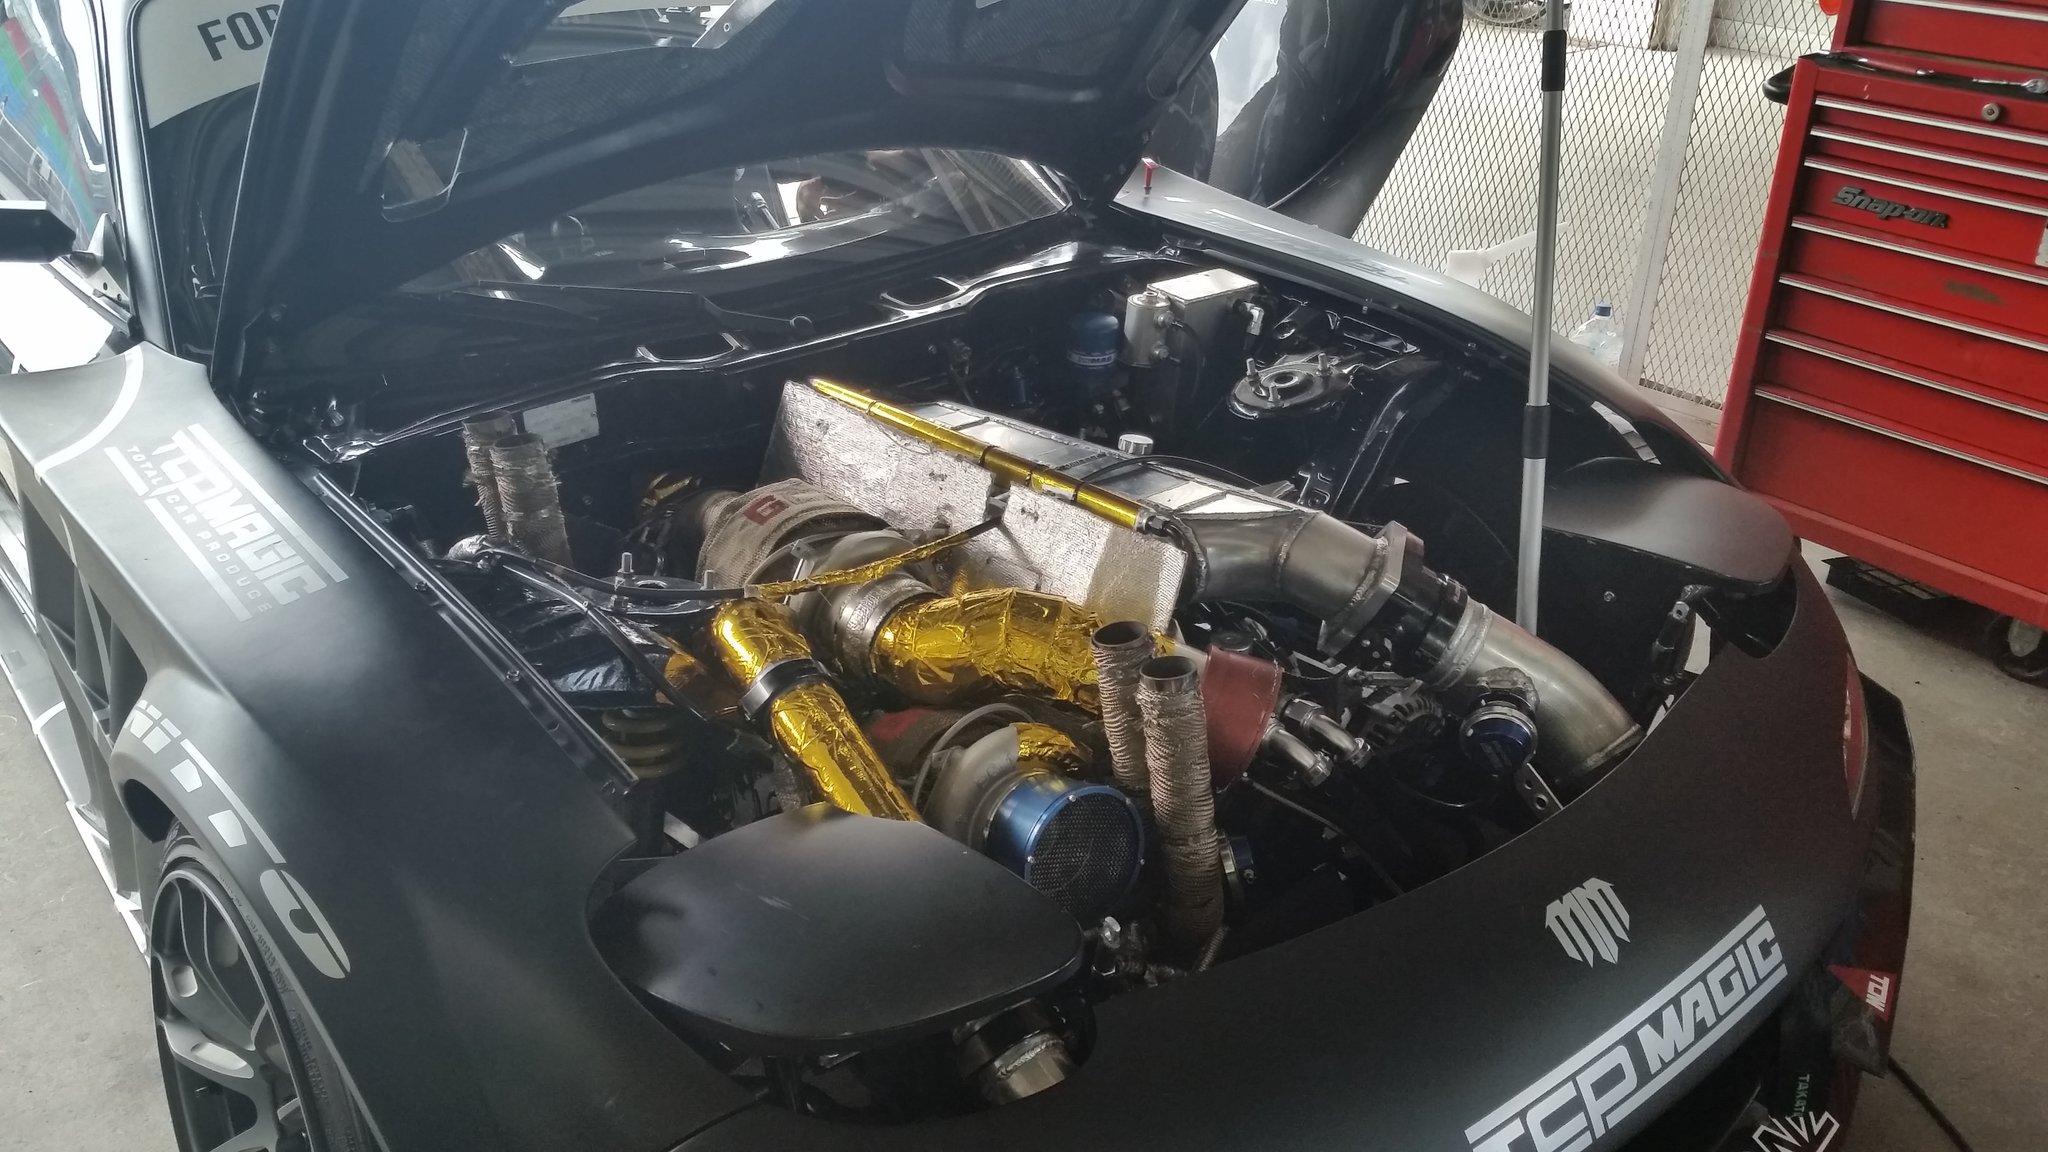 A #HUMBUL quad rotor, twin turbo, quad waste gate, gold engine #brapbrapbrap  #FDJapan #FormulaDrift #tokyodrift https://t.co/gsqM9FD4wS